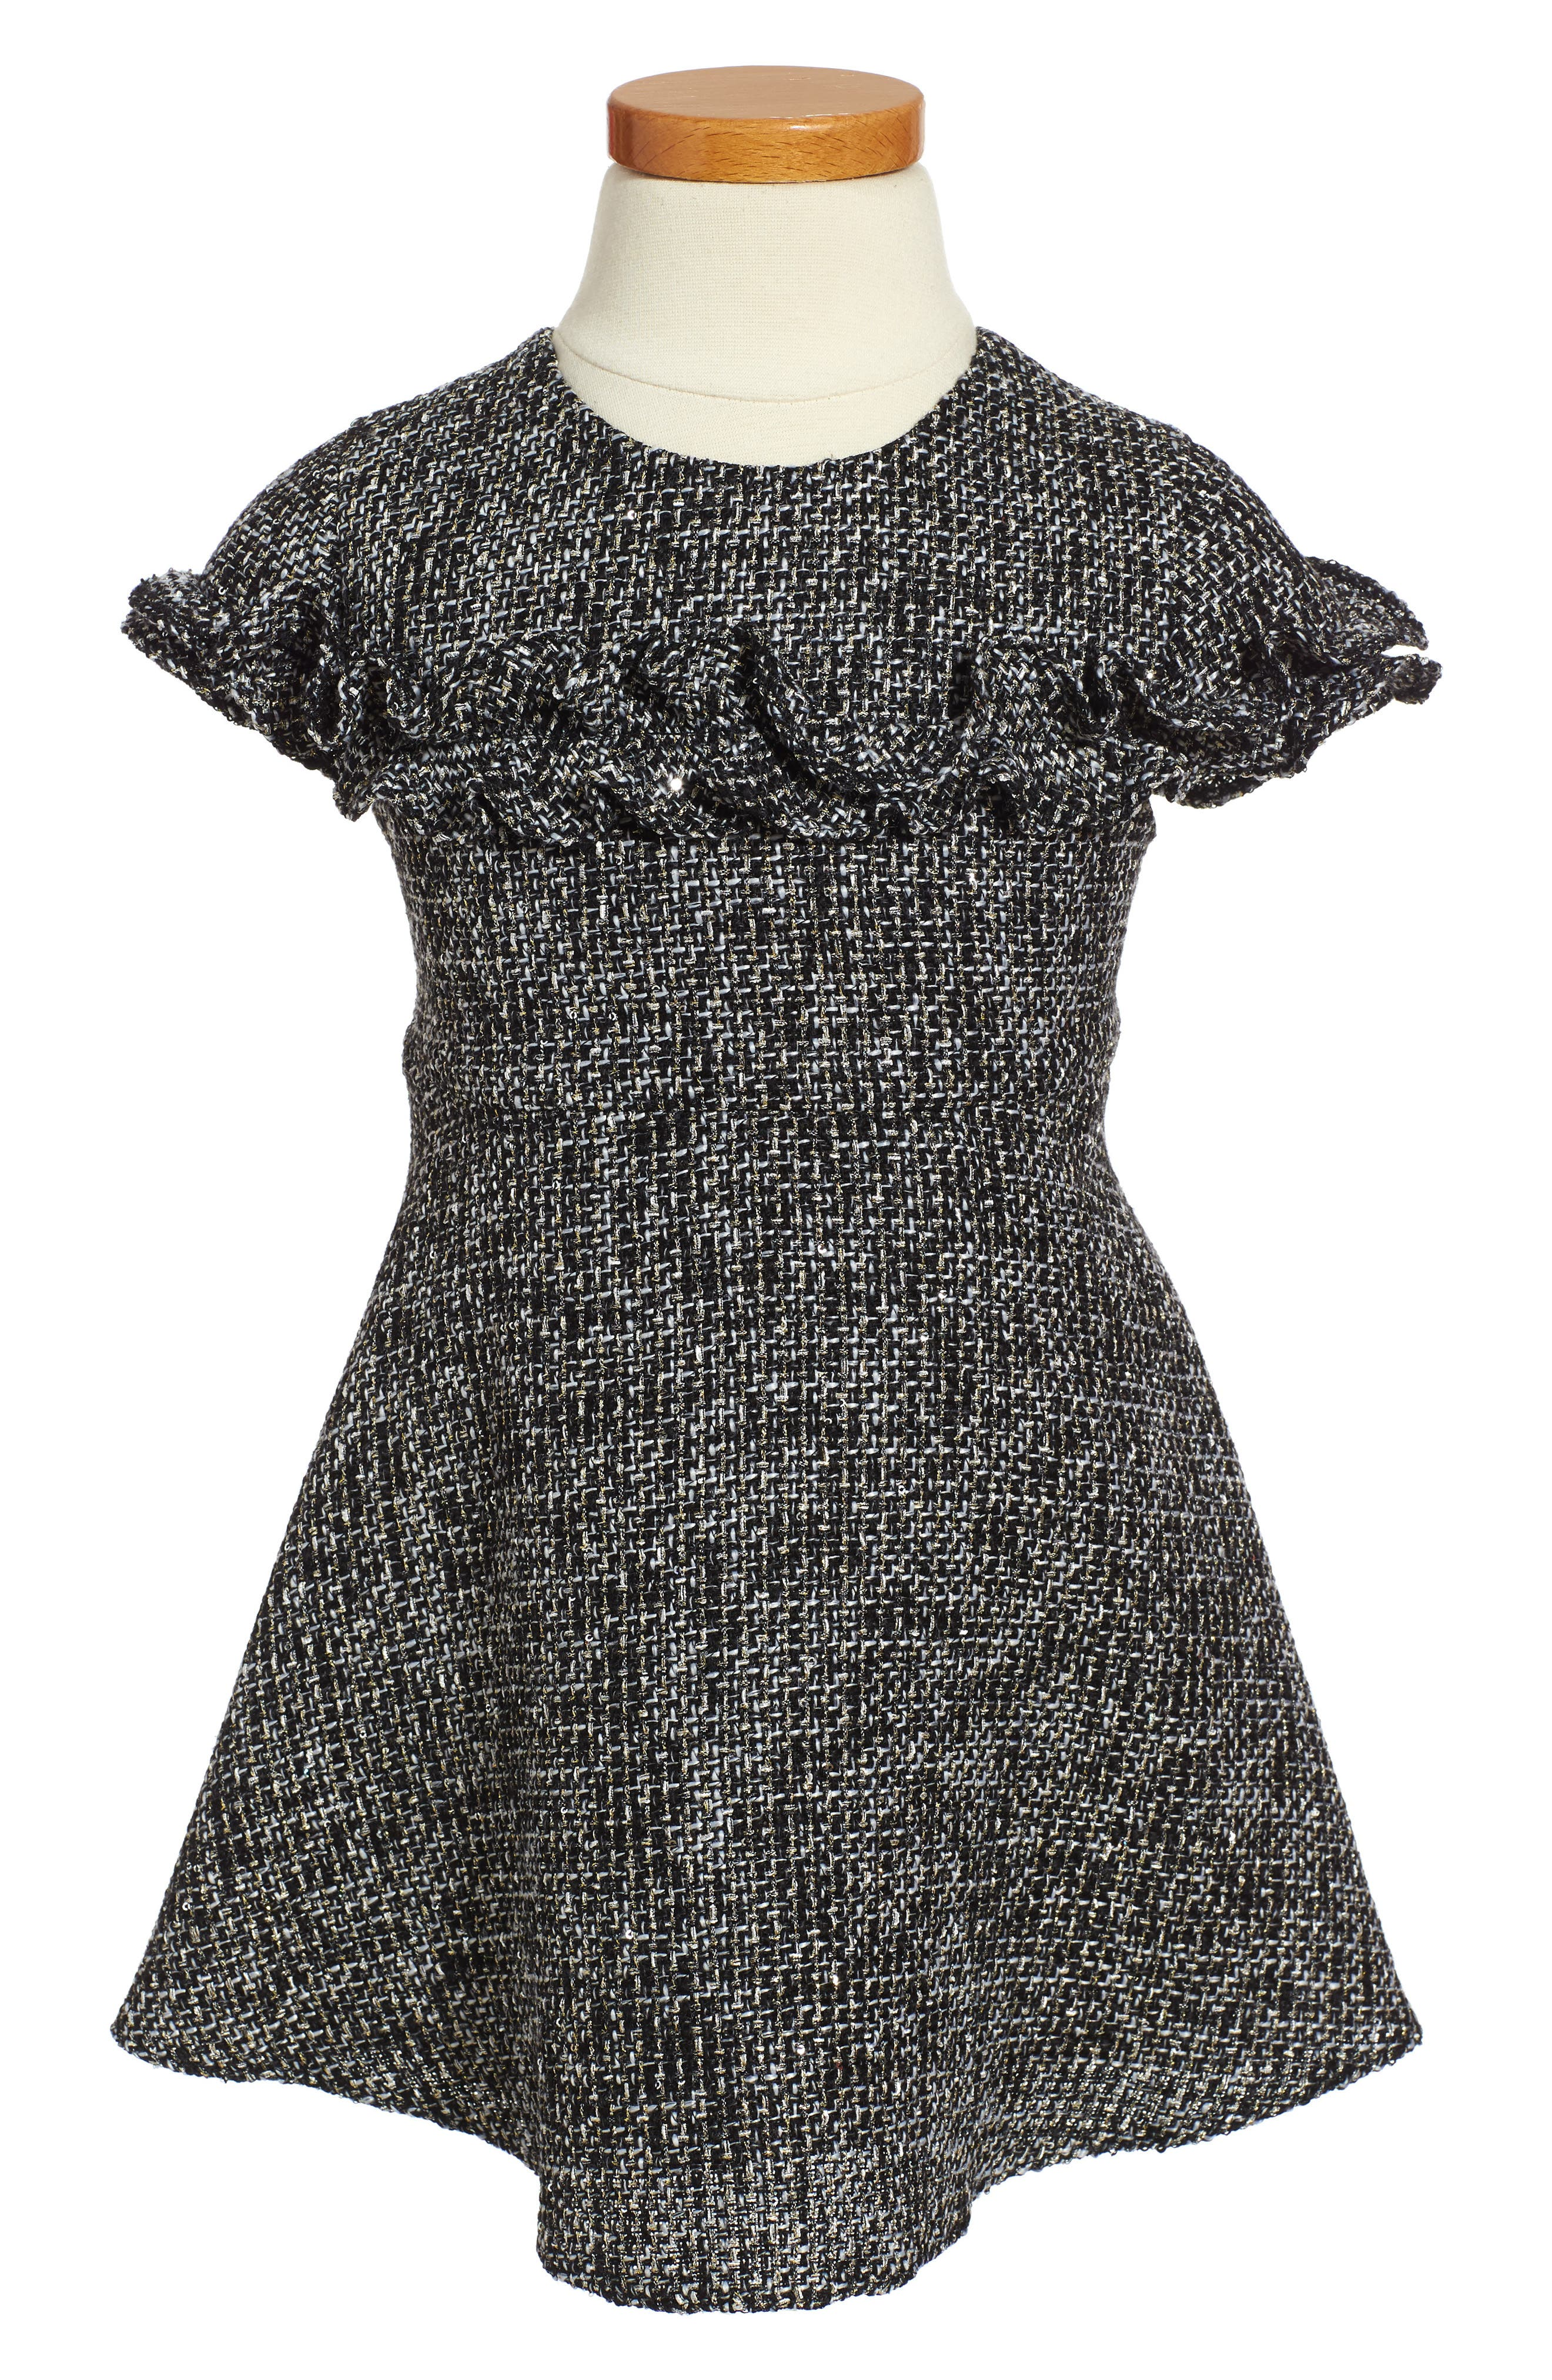 David Charles Sequin Tweed Dress (Toddler Girls & Little Girls)